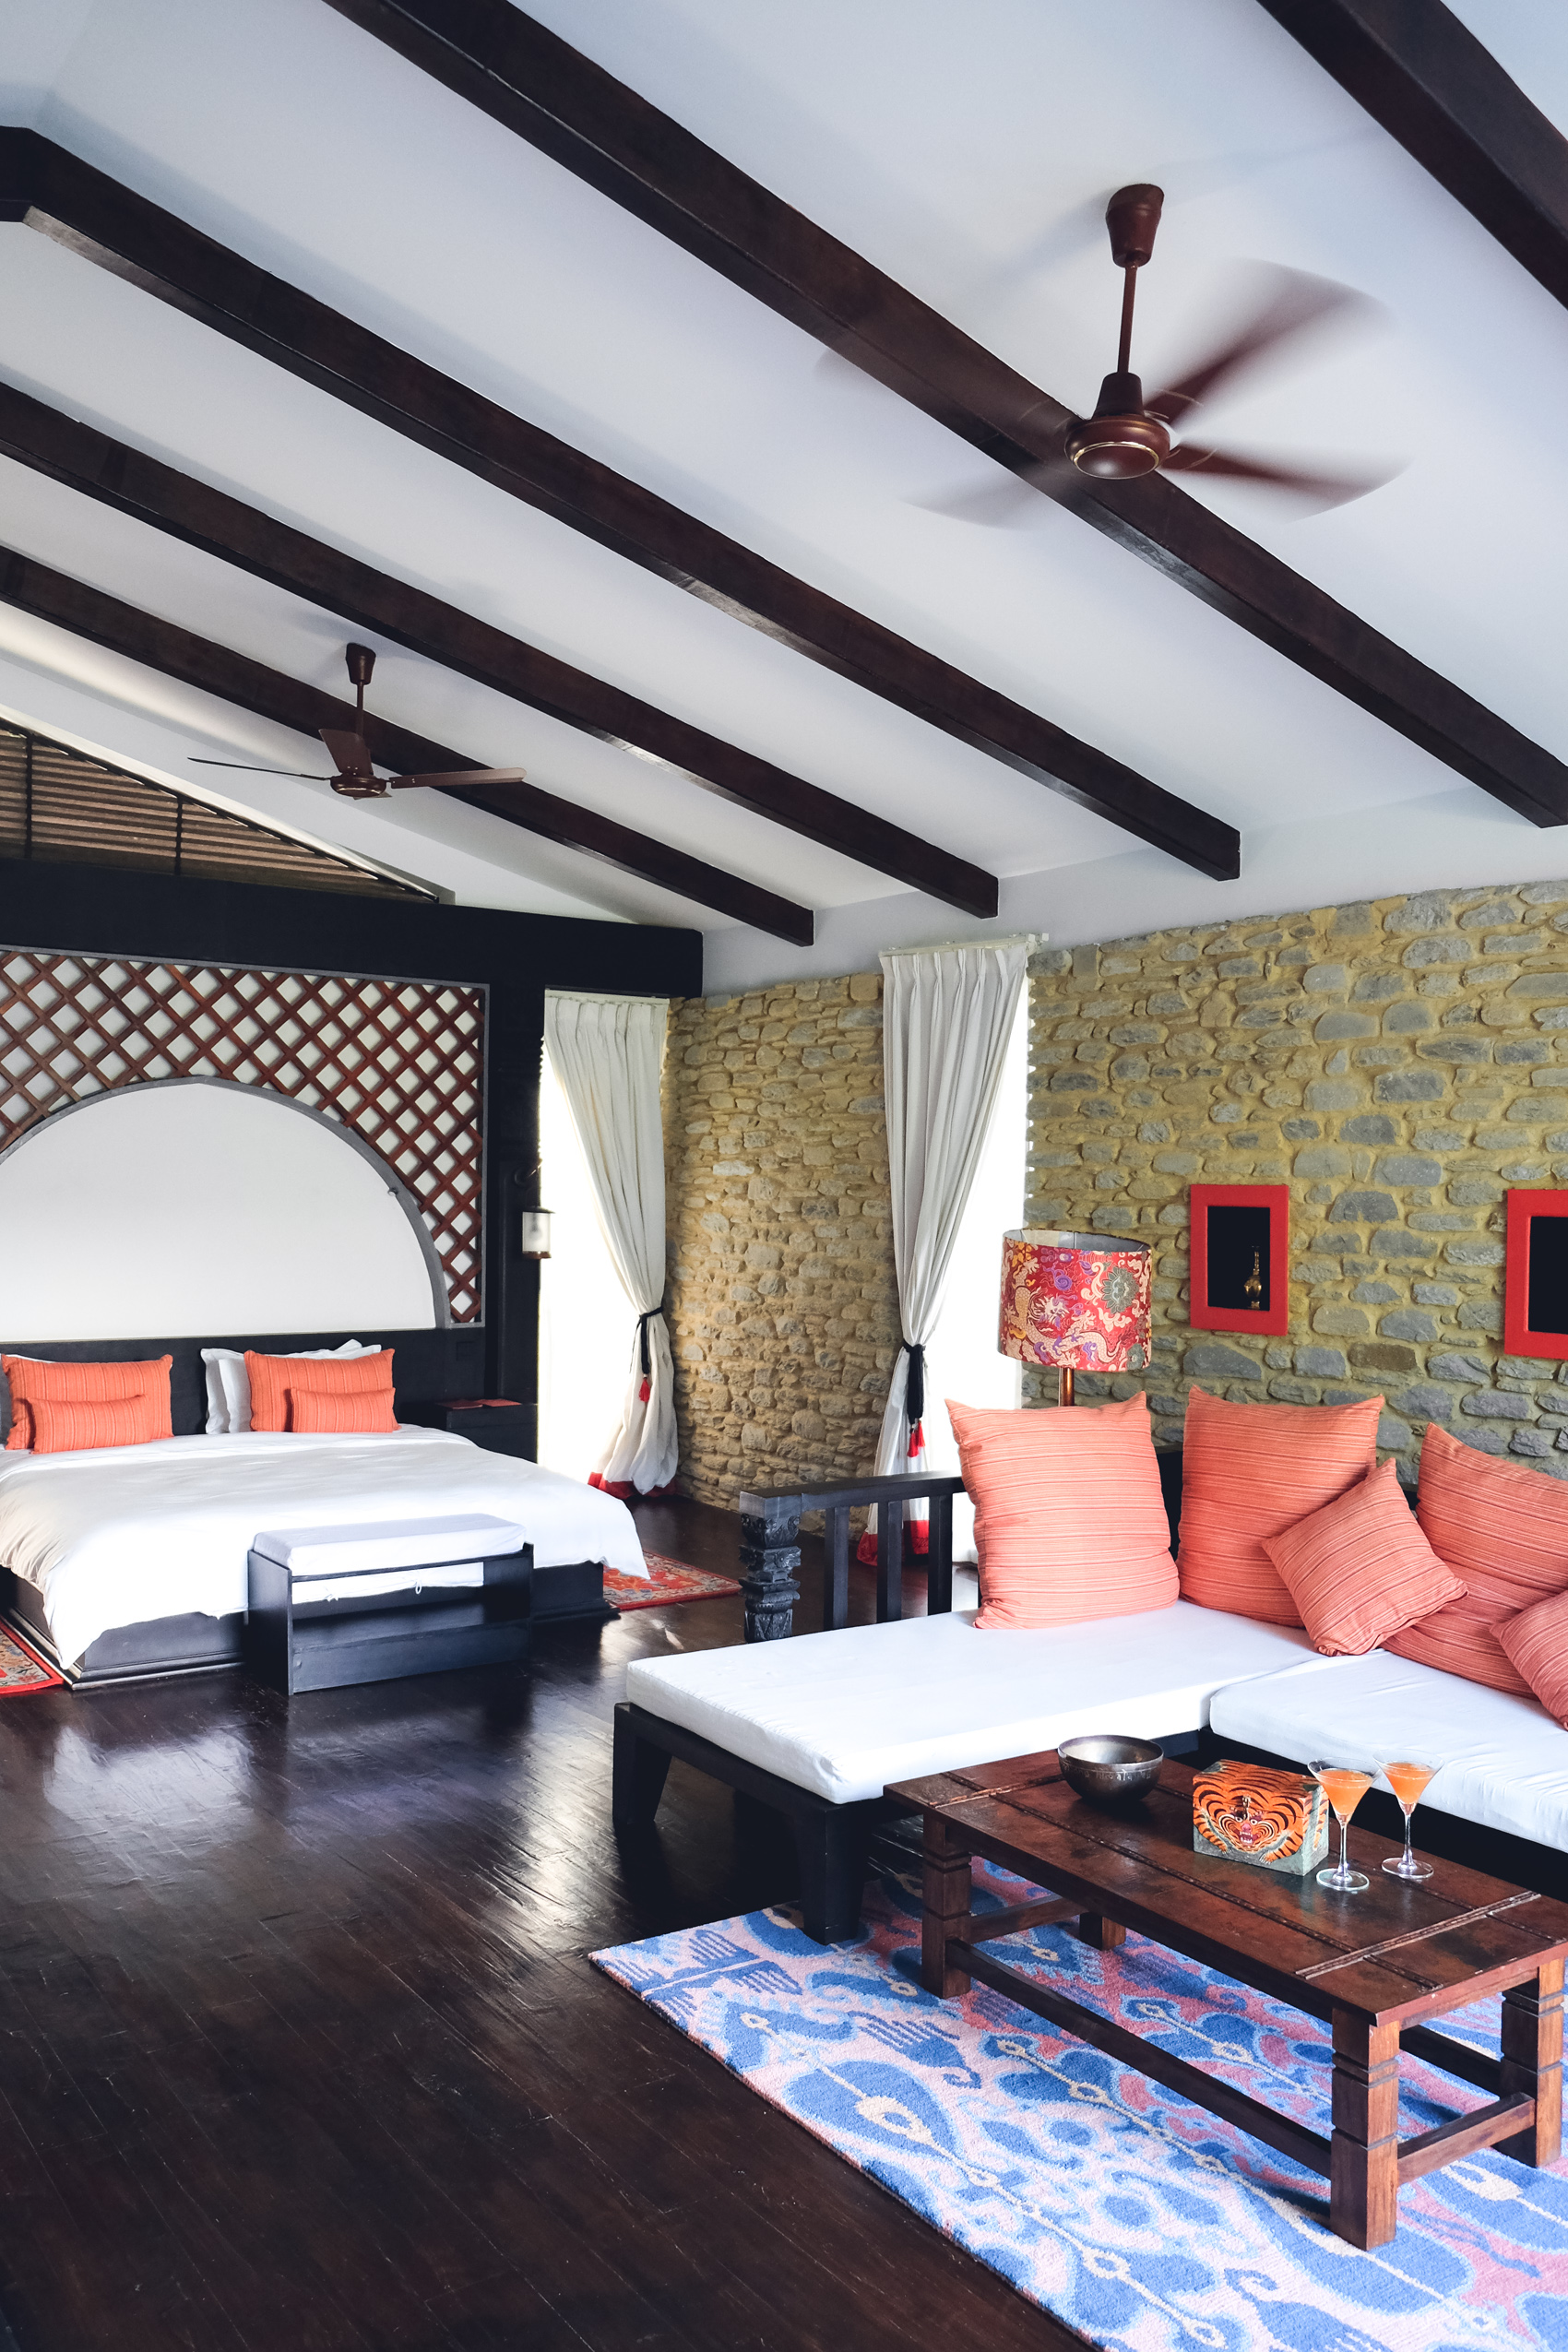 pavilions-himalayas-3-of-23